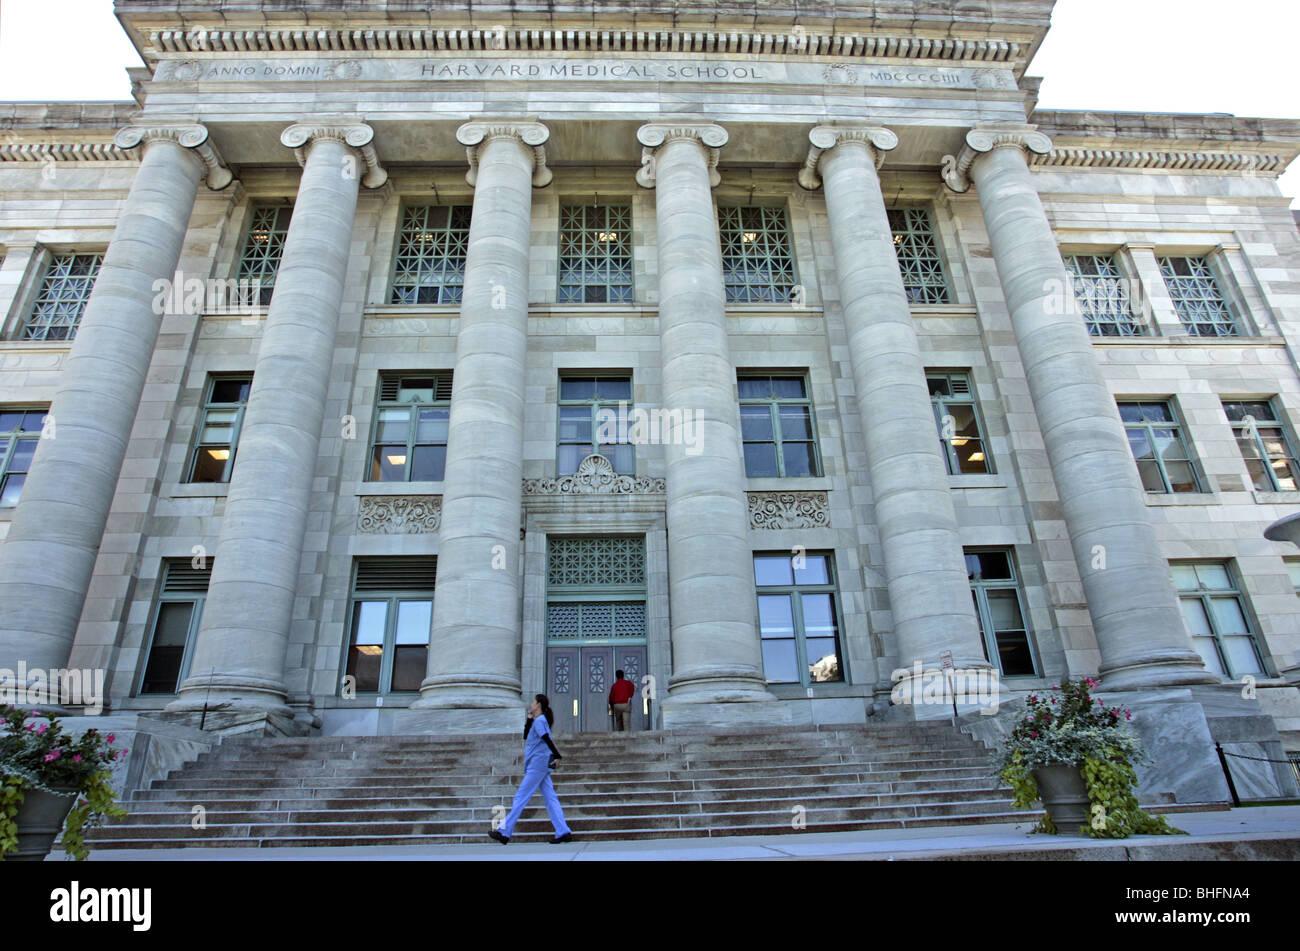 Harvard Medical School Boston - Stock Image